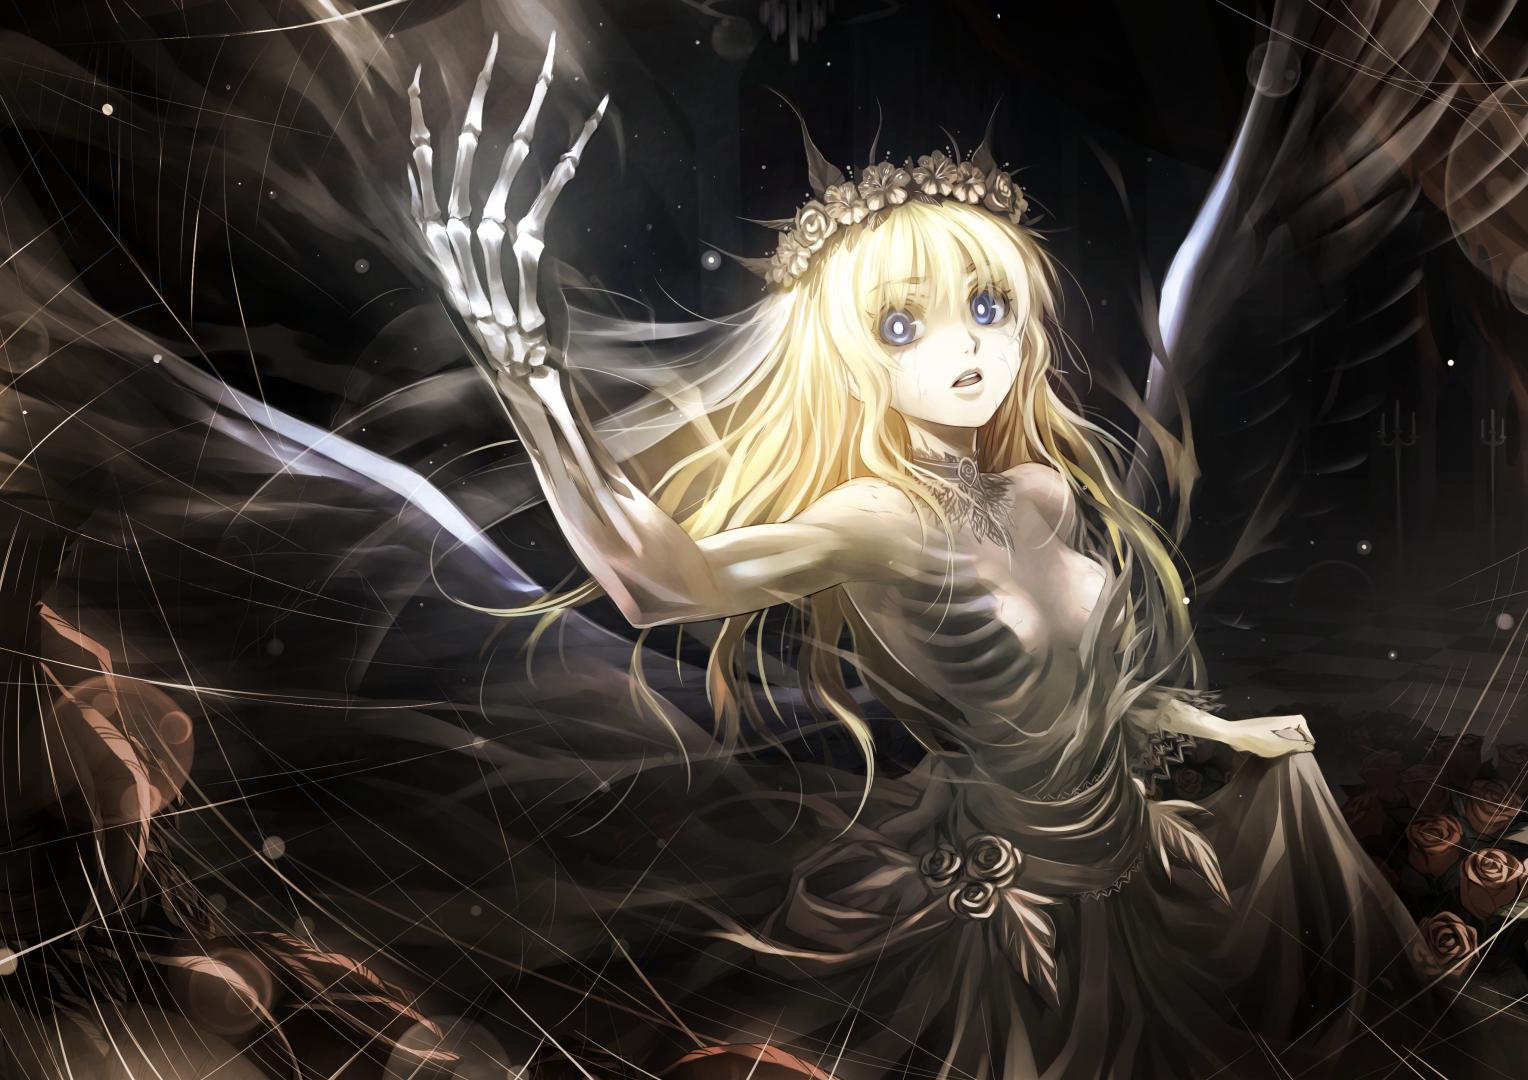 Haunting Anime Angel (Ghost Girl By Kriss) Chucks Anime